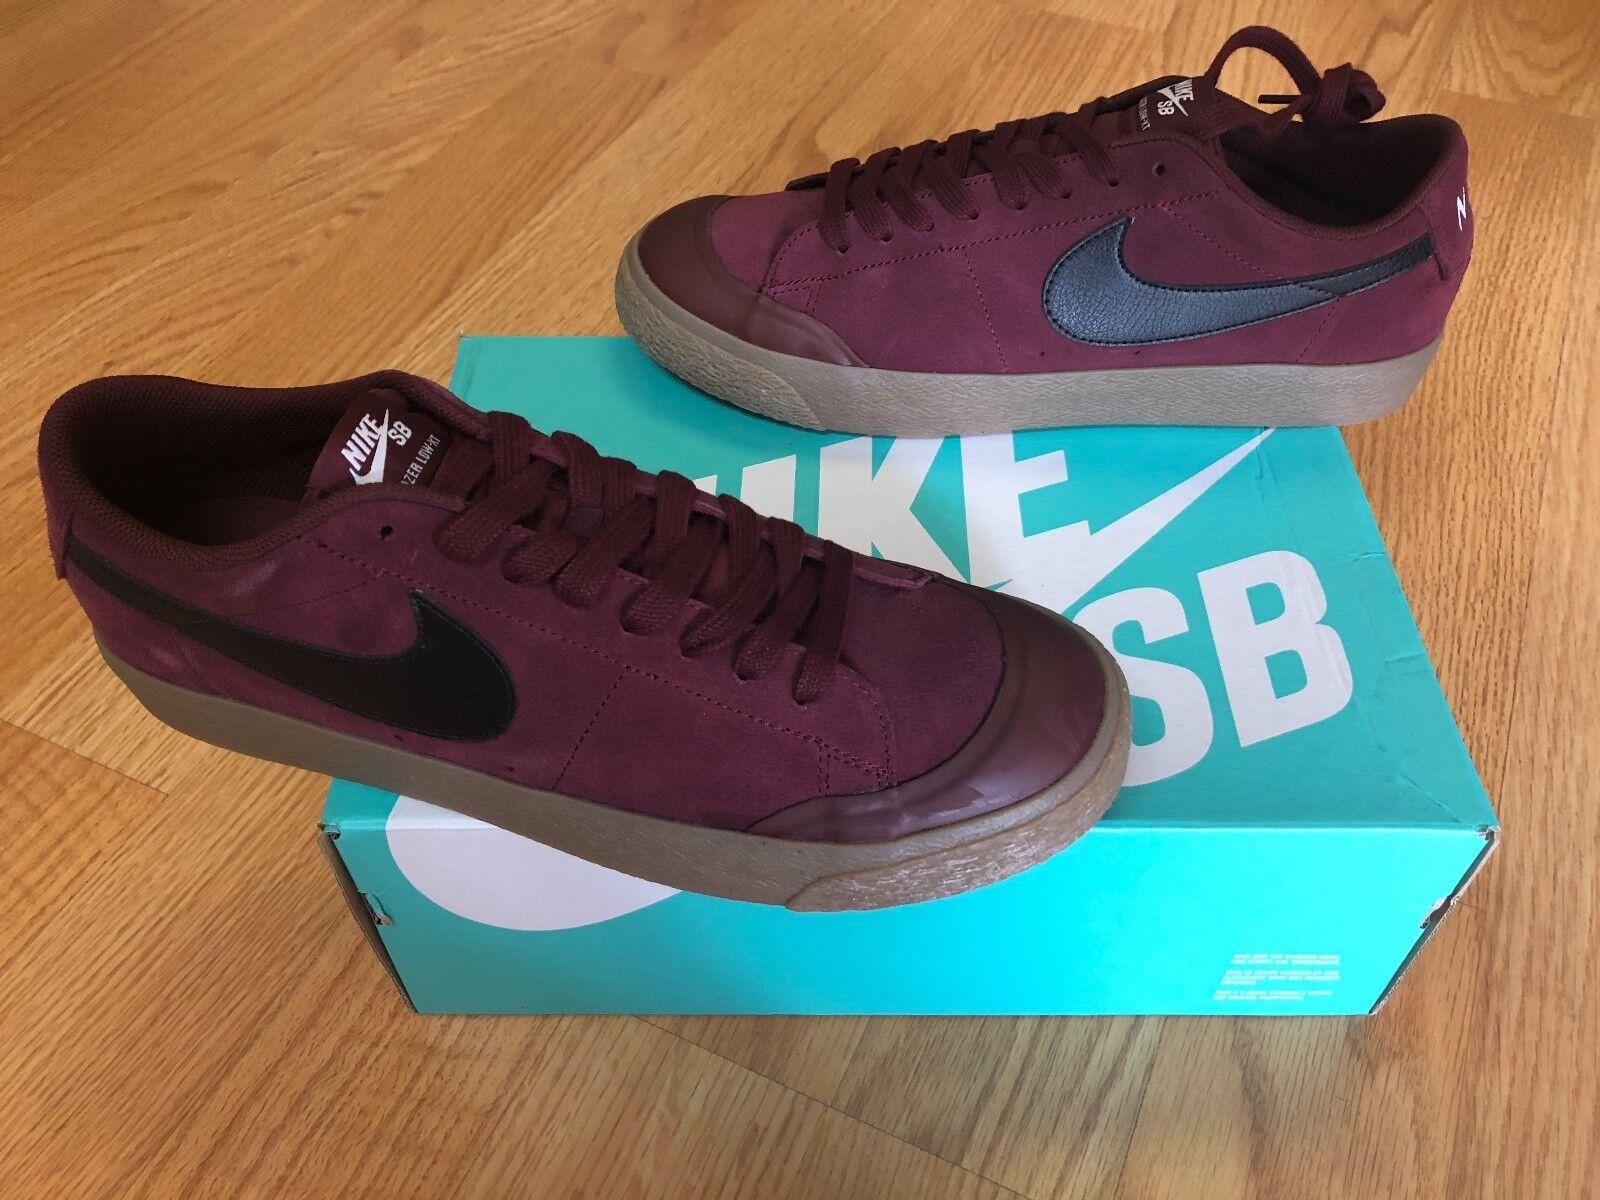 Nike SB Blazer Low Zoom XT Dark Team Red11.5 TZ,NRG,6.0,jordan,rare,Skate,sample